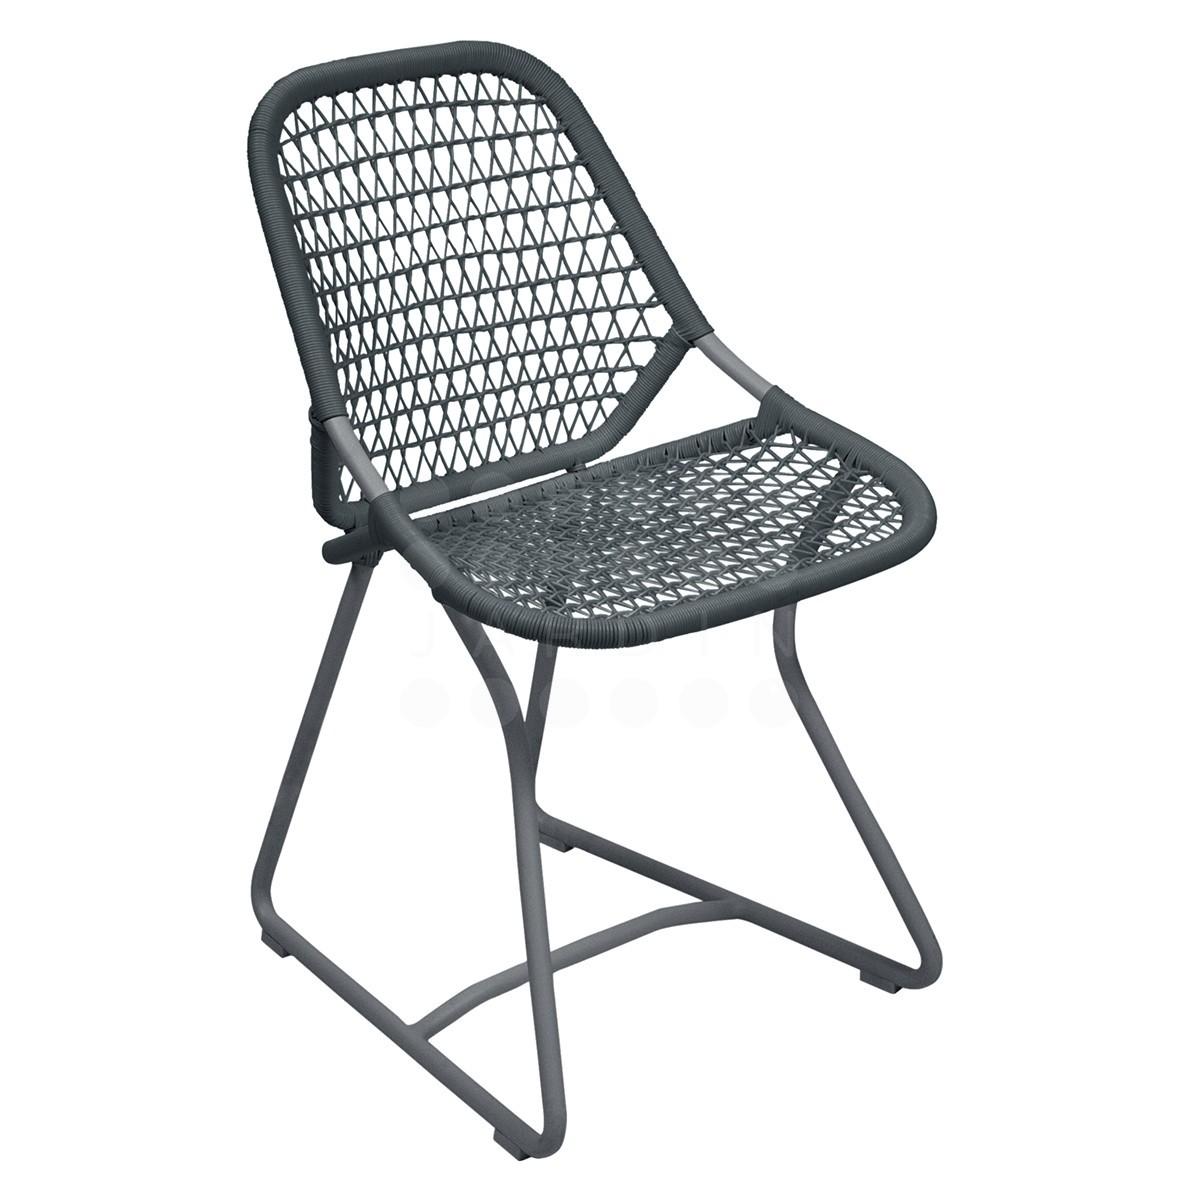 Astonishing Fermob Sixties Dining Chair Outdoor Furniture Jardin Nz Ibusinesslaw Wood Chair Design Ideas Ibusinesslaworg